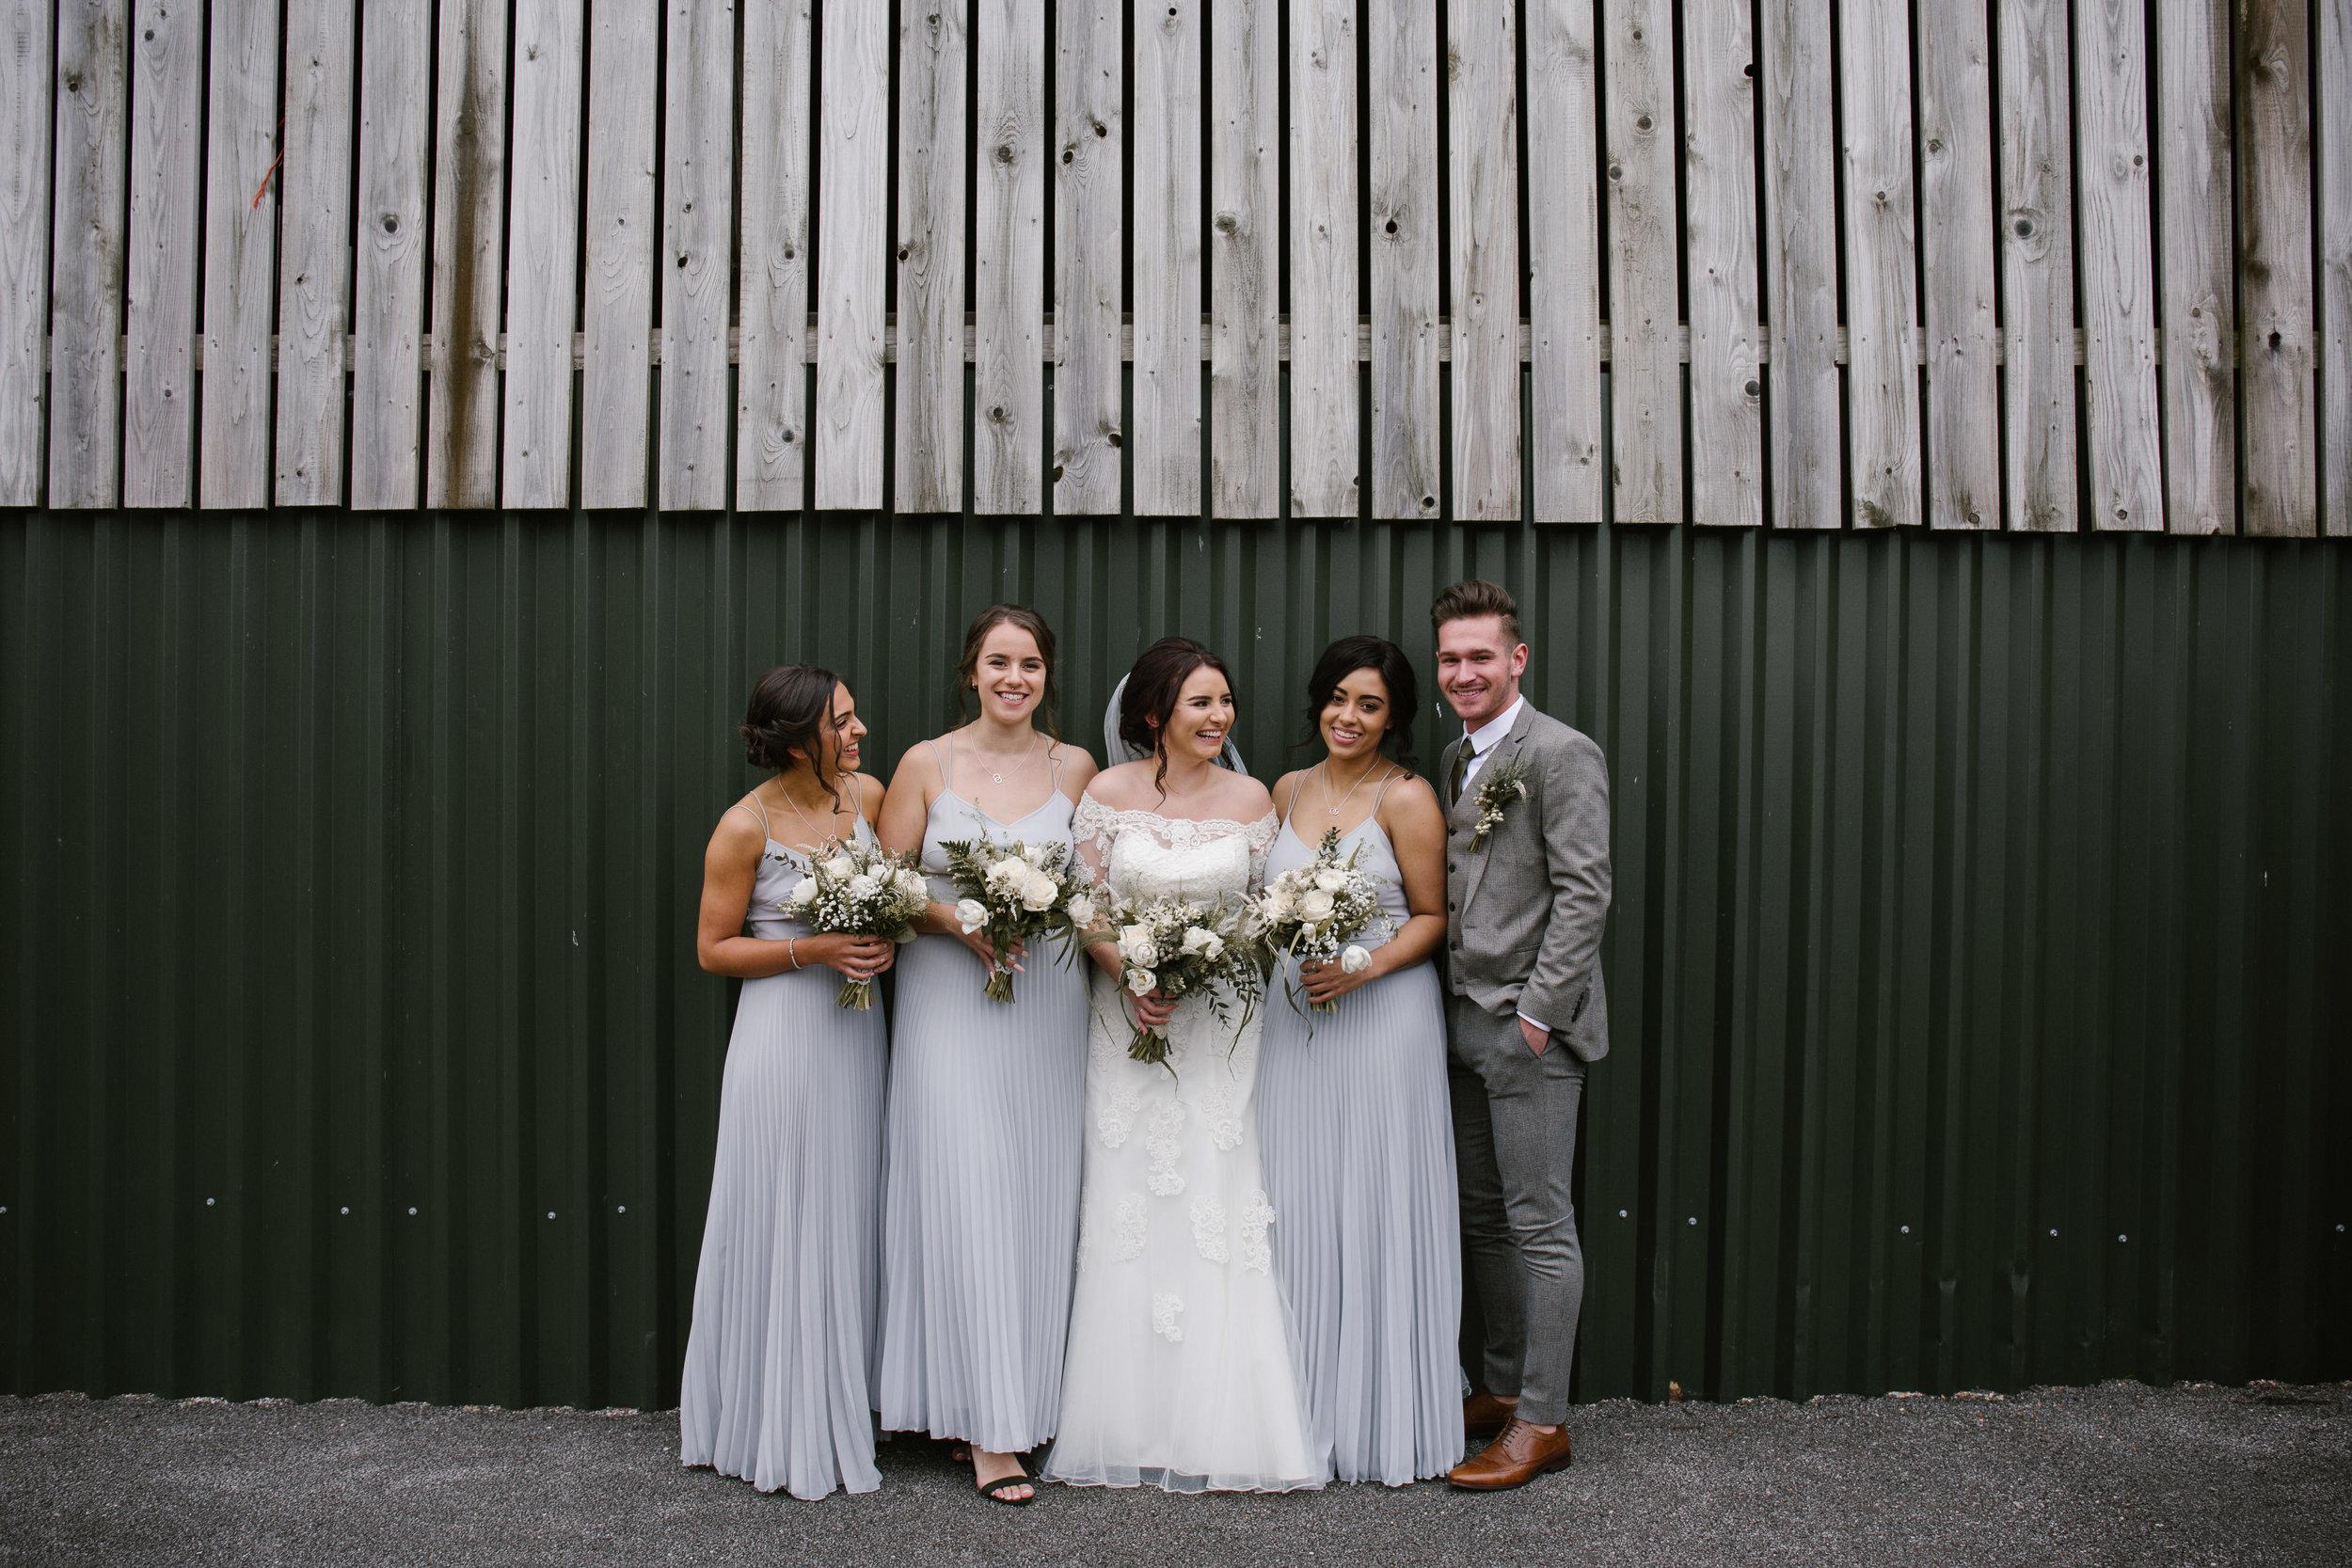 Sandhole Oak Barn, Rustic Wedding, DIY Wedding, Manchester wedding photographer, Birmingham wedding photographer, barn wedding-174.jpg